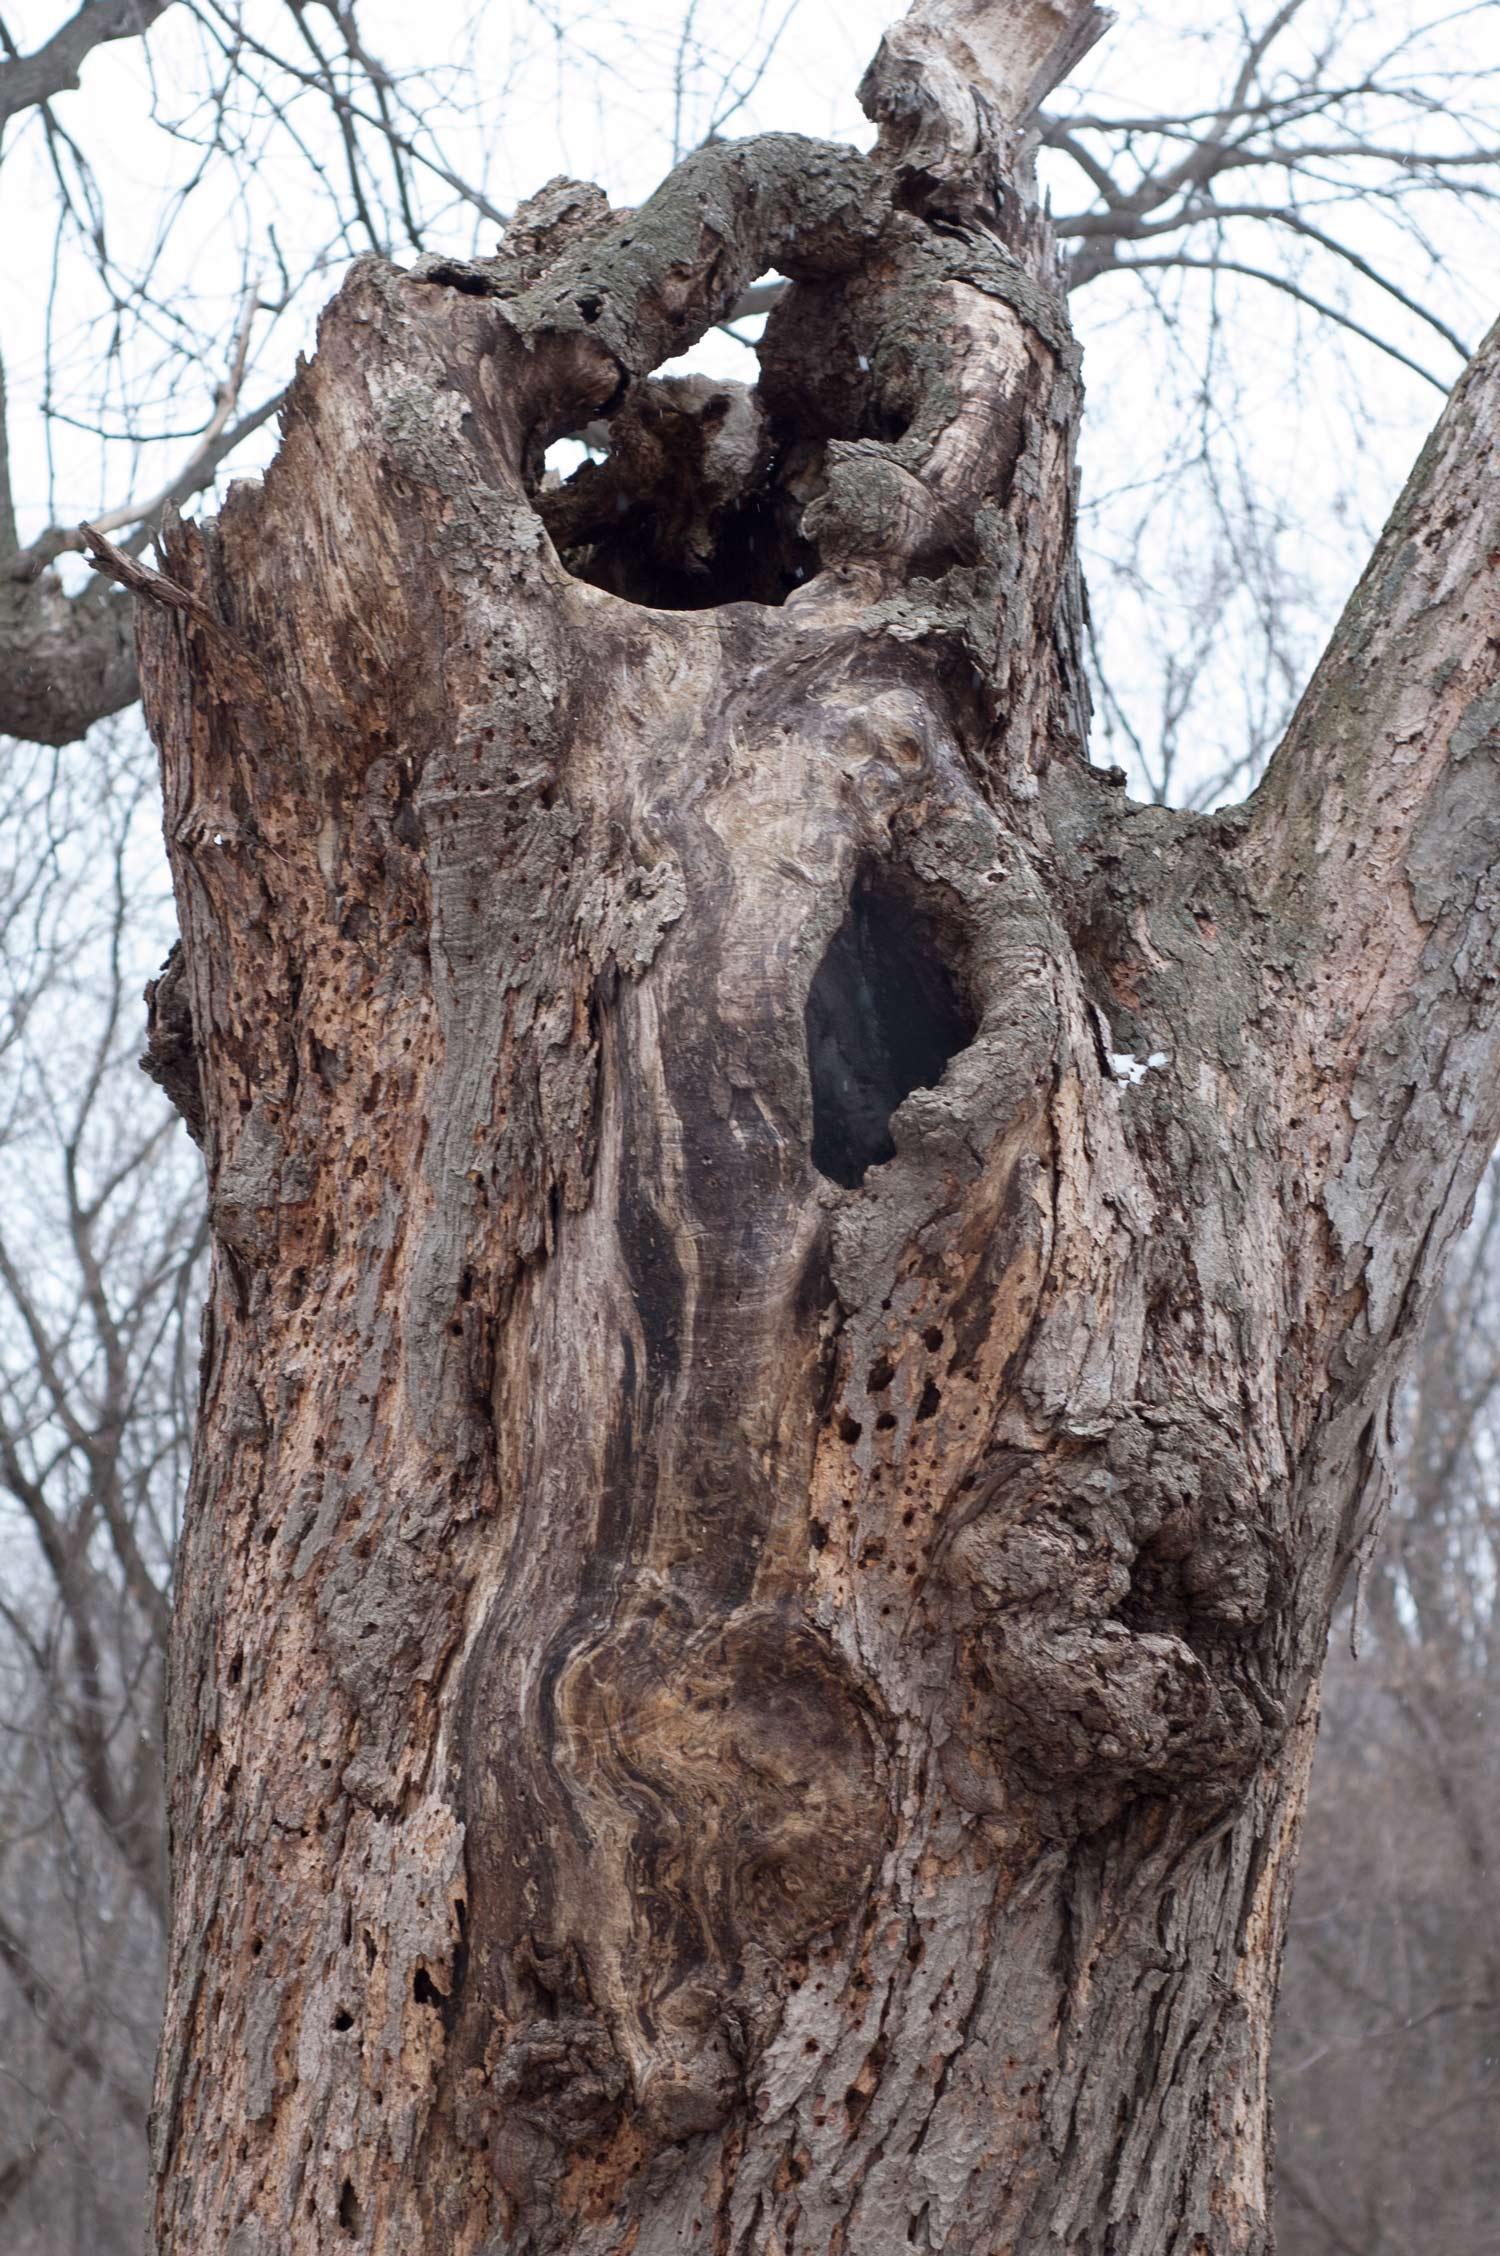 Silver Maple (Acer saccharinum) snag